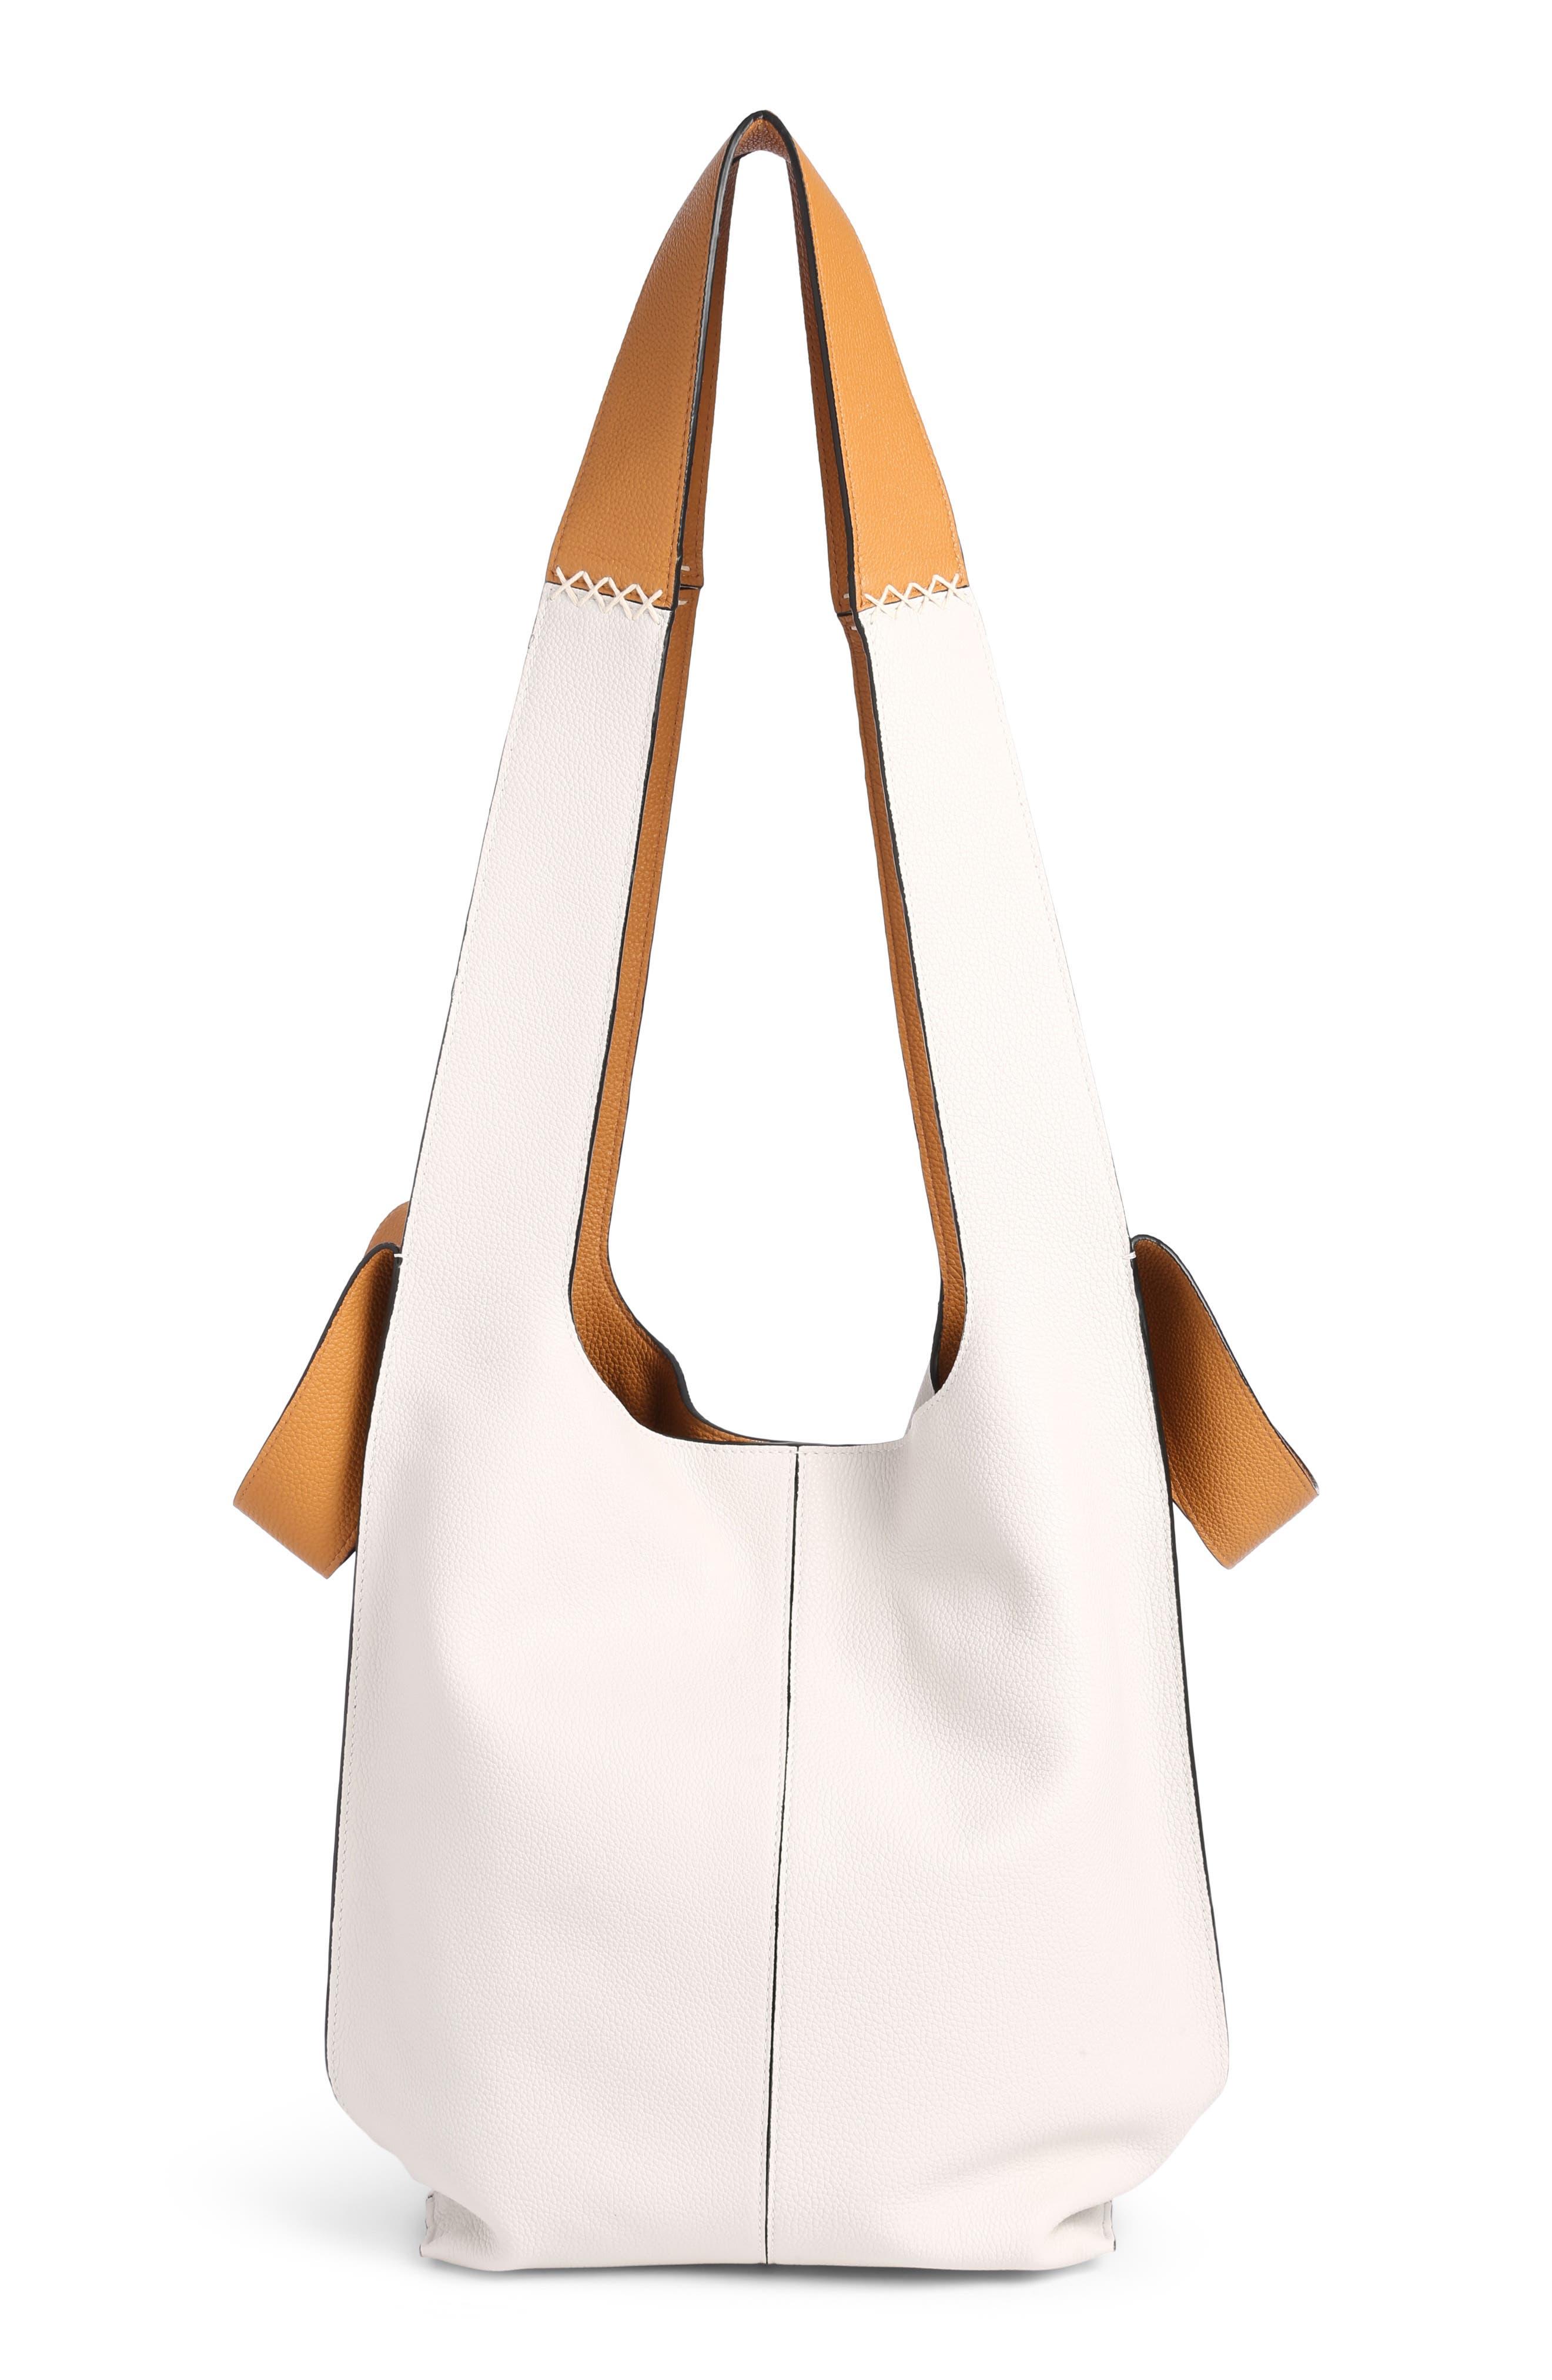 Leather Hobo Tote Bag,                             Alternate thumbnail 2, color,                             141